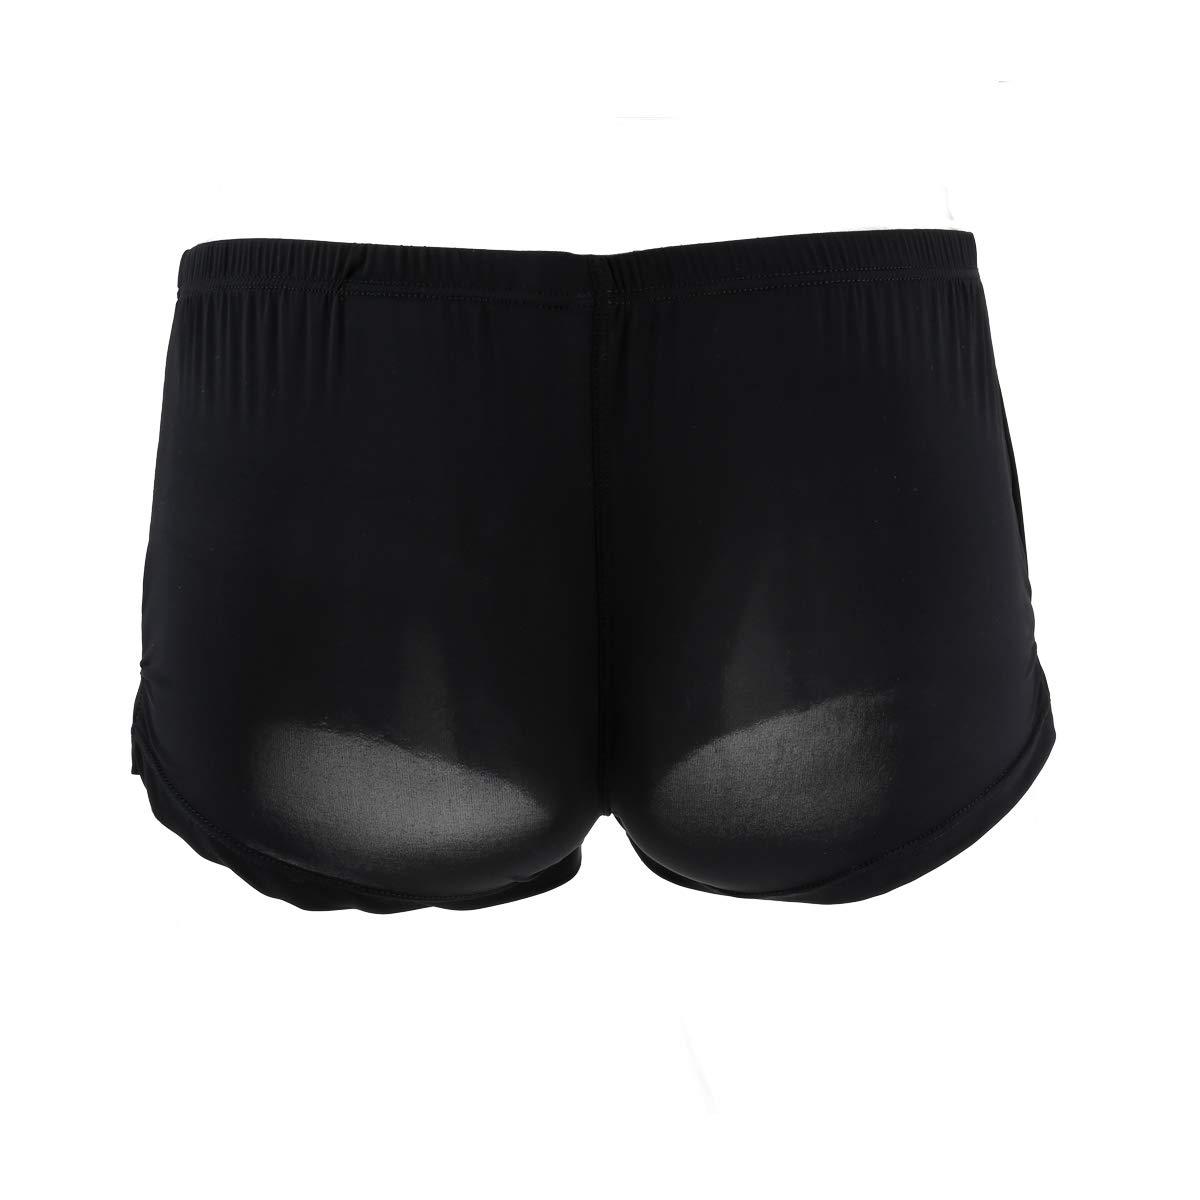 Men Boxer Shorts Solid Ice Silk Underwear U Convex Pouch Underpants Male Arrow Pants